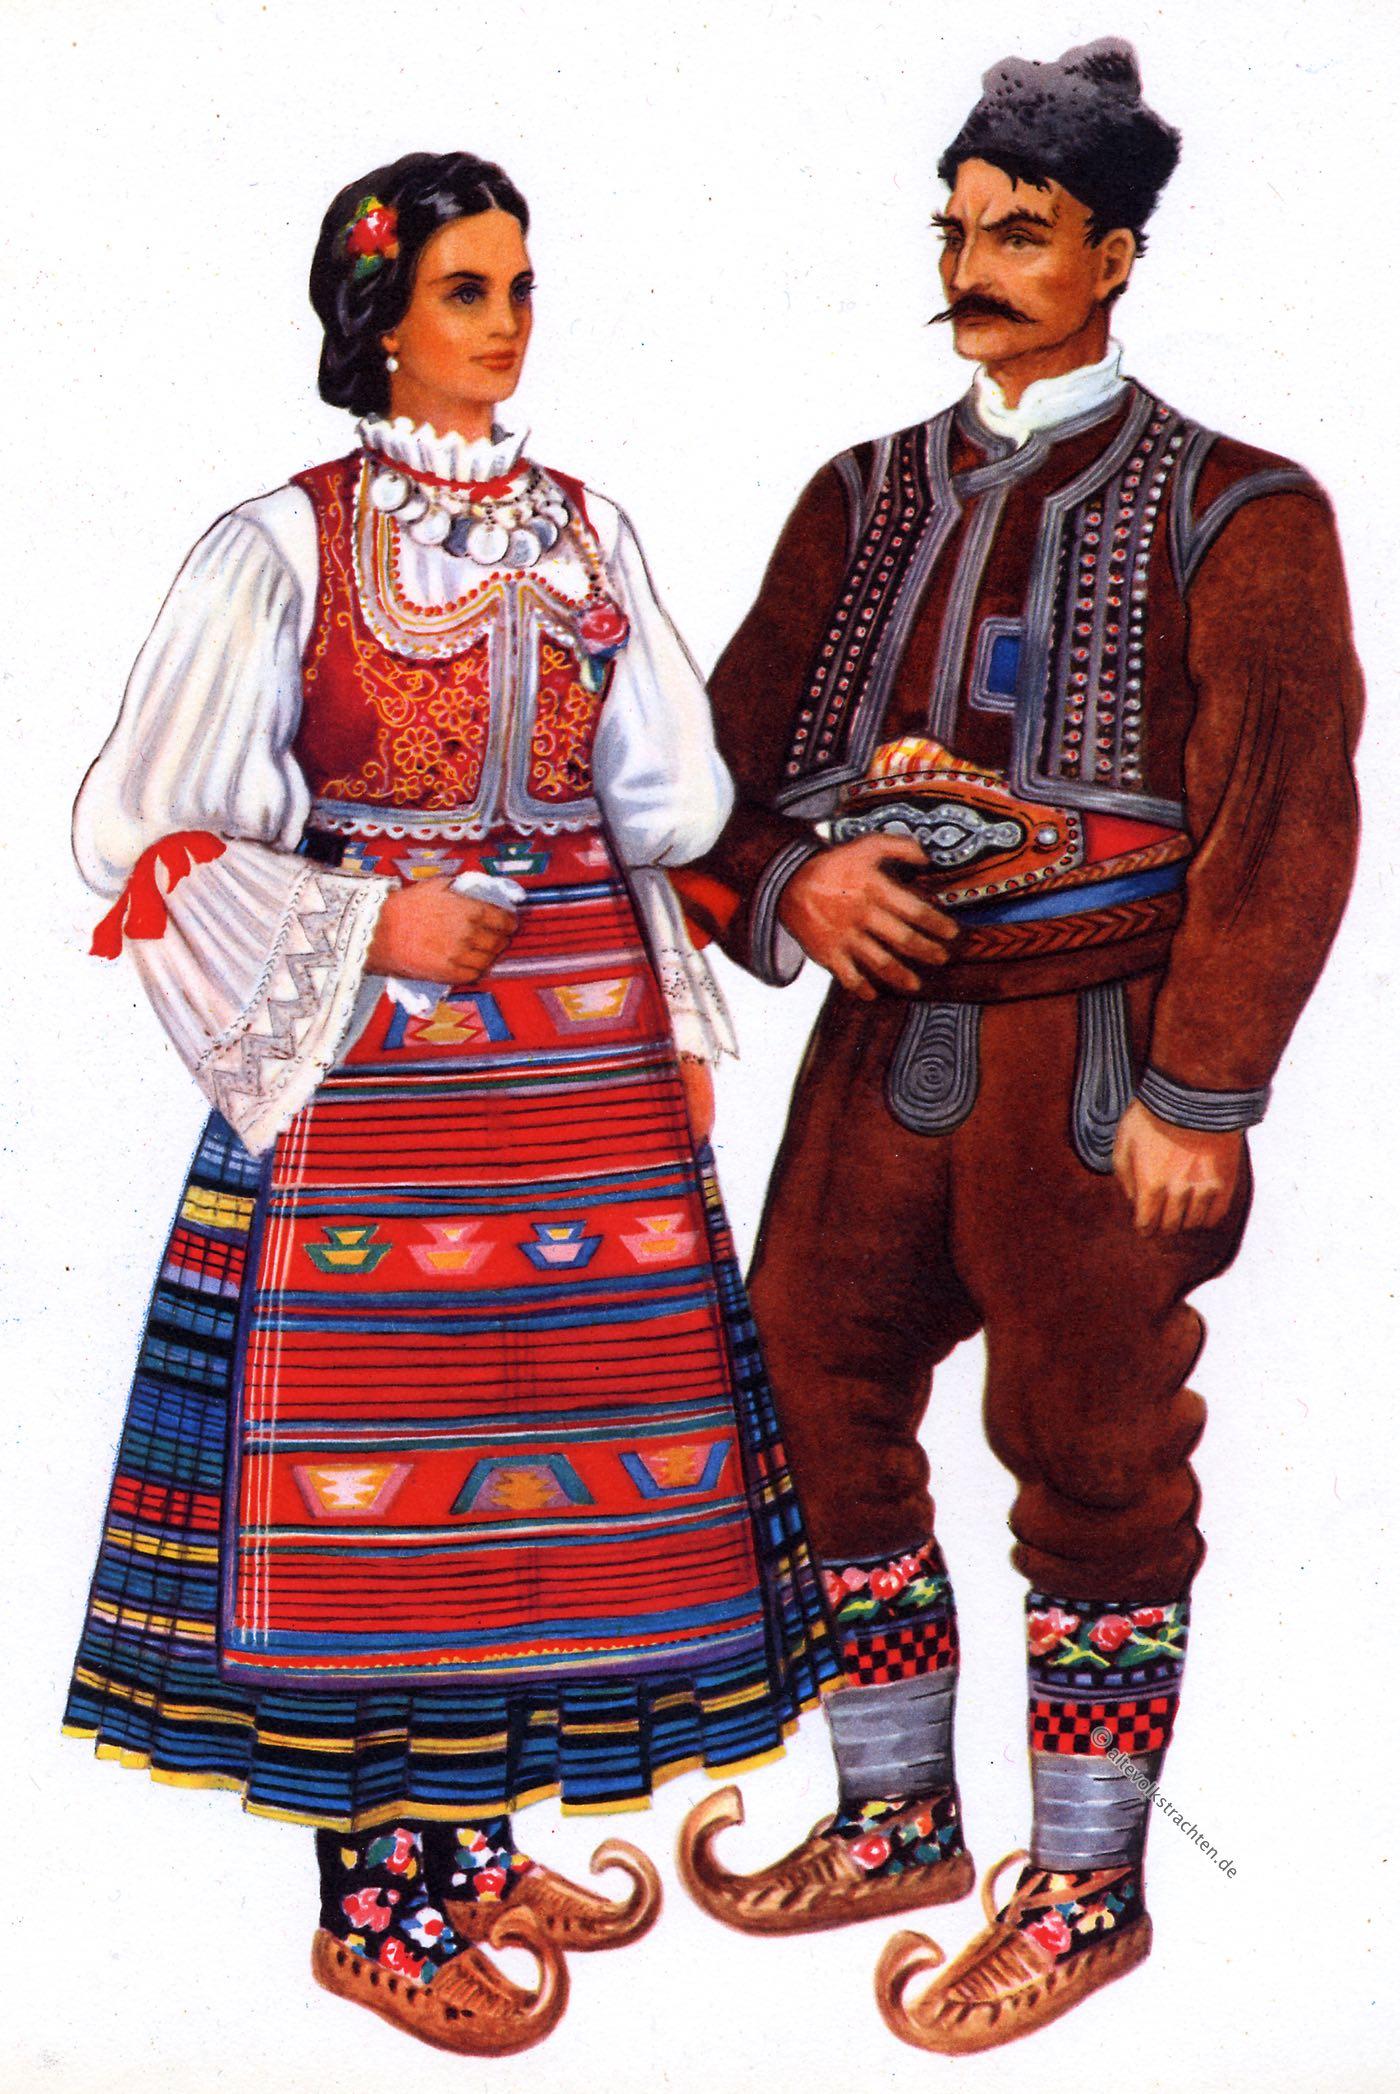 Šumadij, Trachten, Serben, Serbien Vladimir, Kirin, Srpske, nacionalne, kostime,